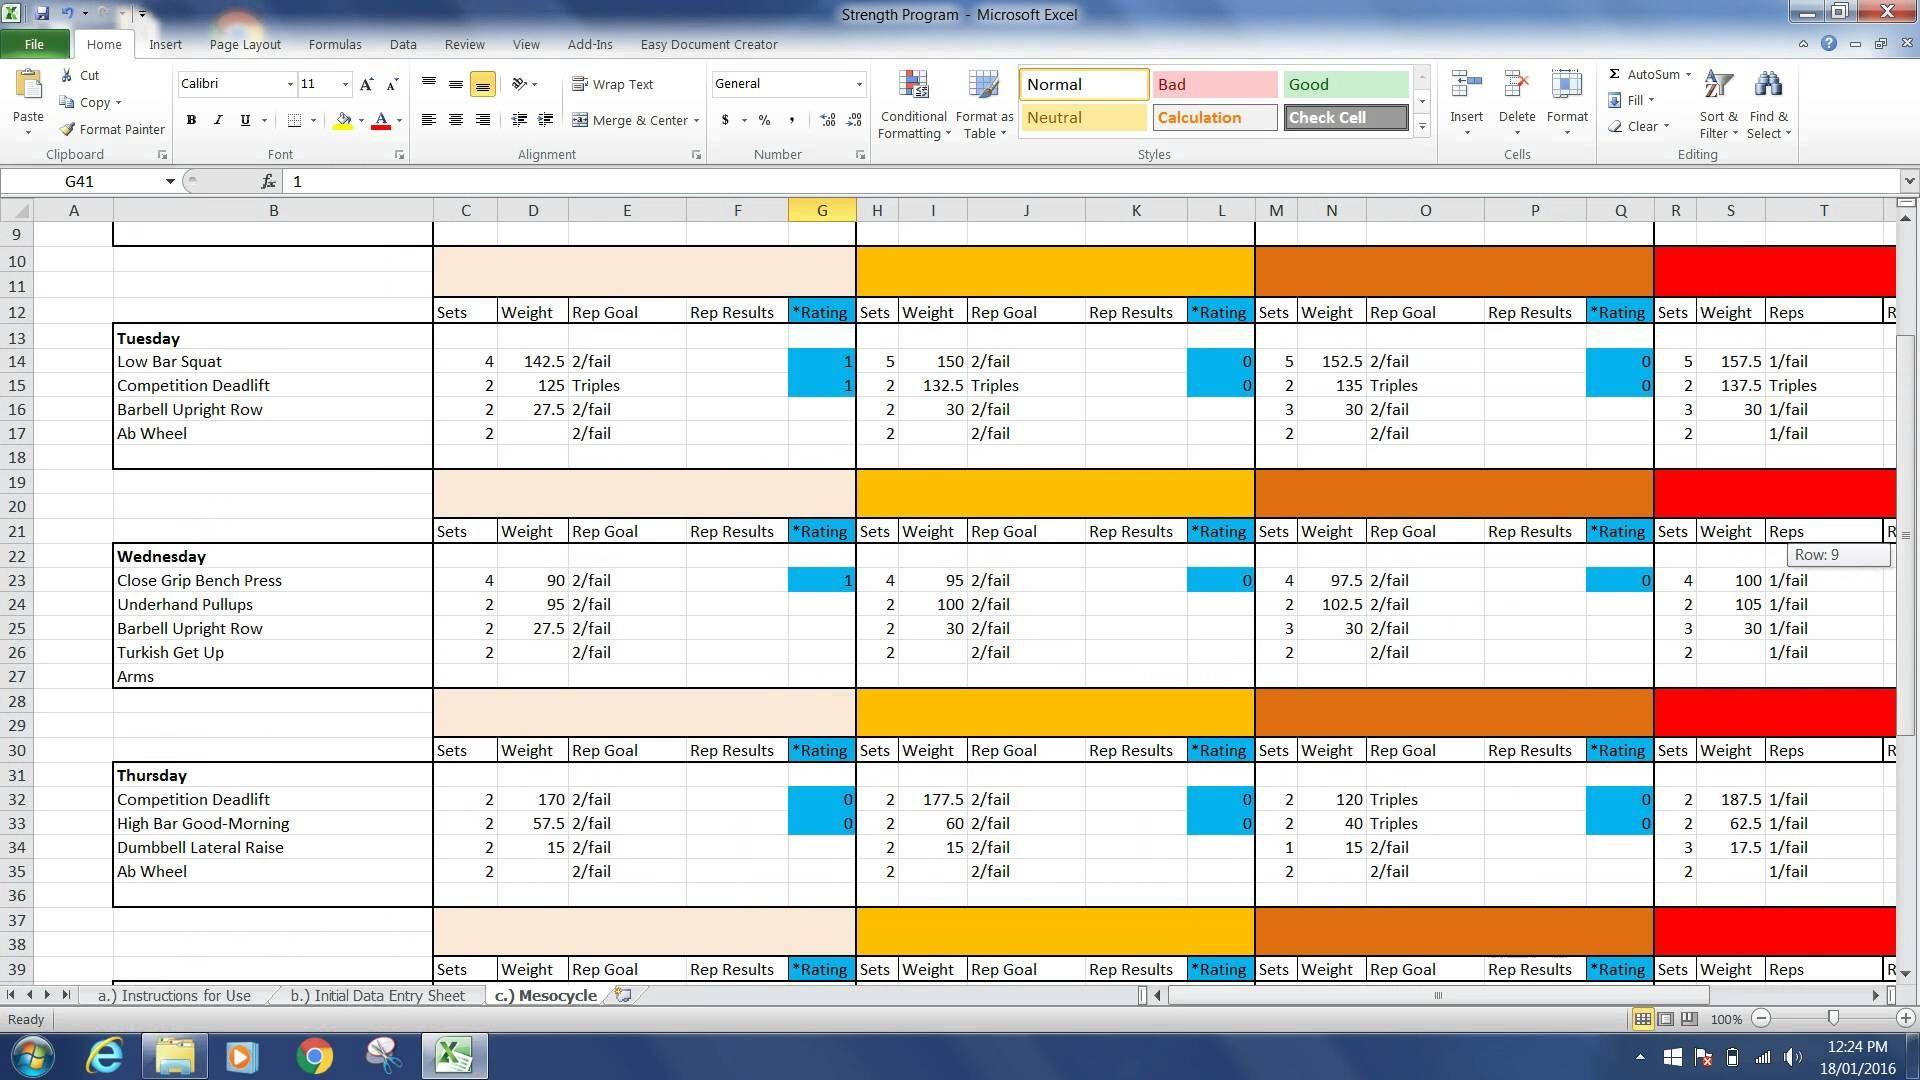 Vegan Template Screenshot Renaissance Periodization Auto Templates